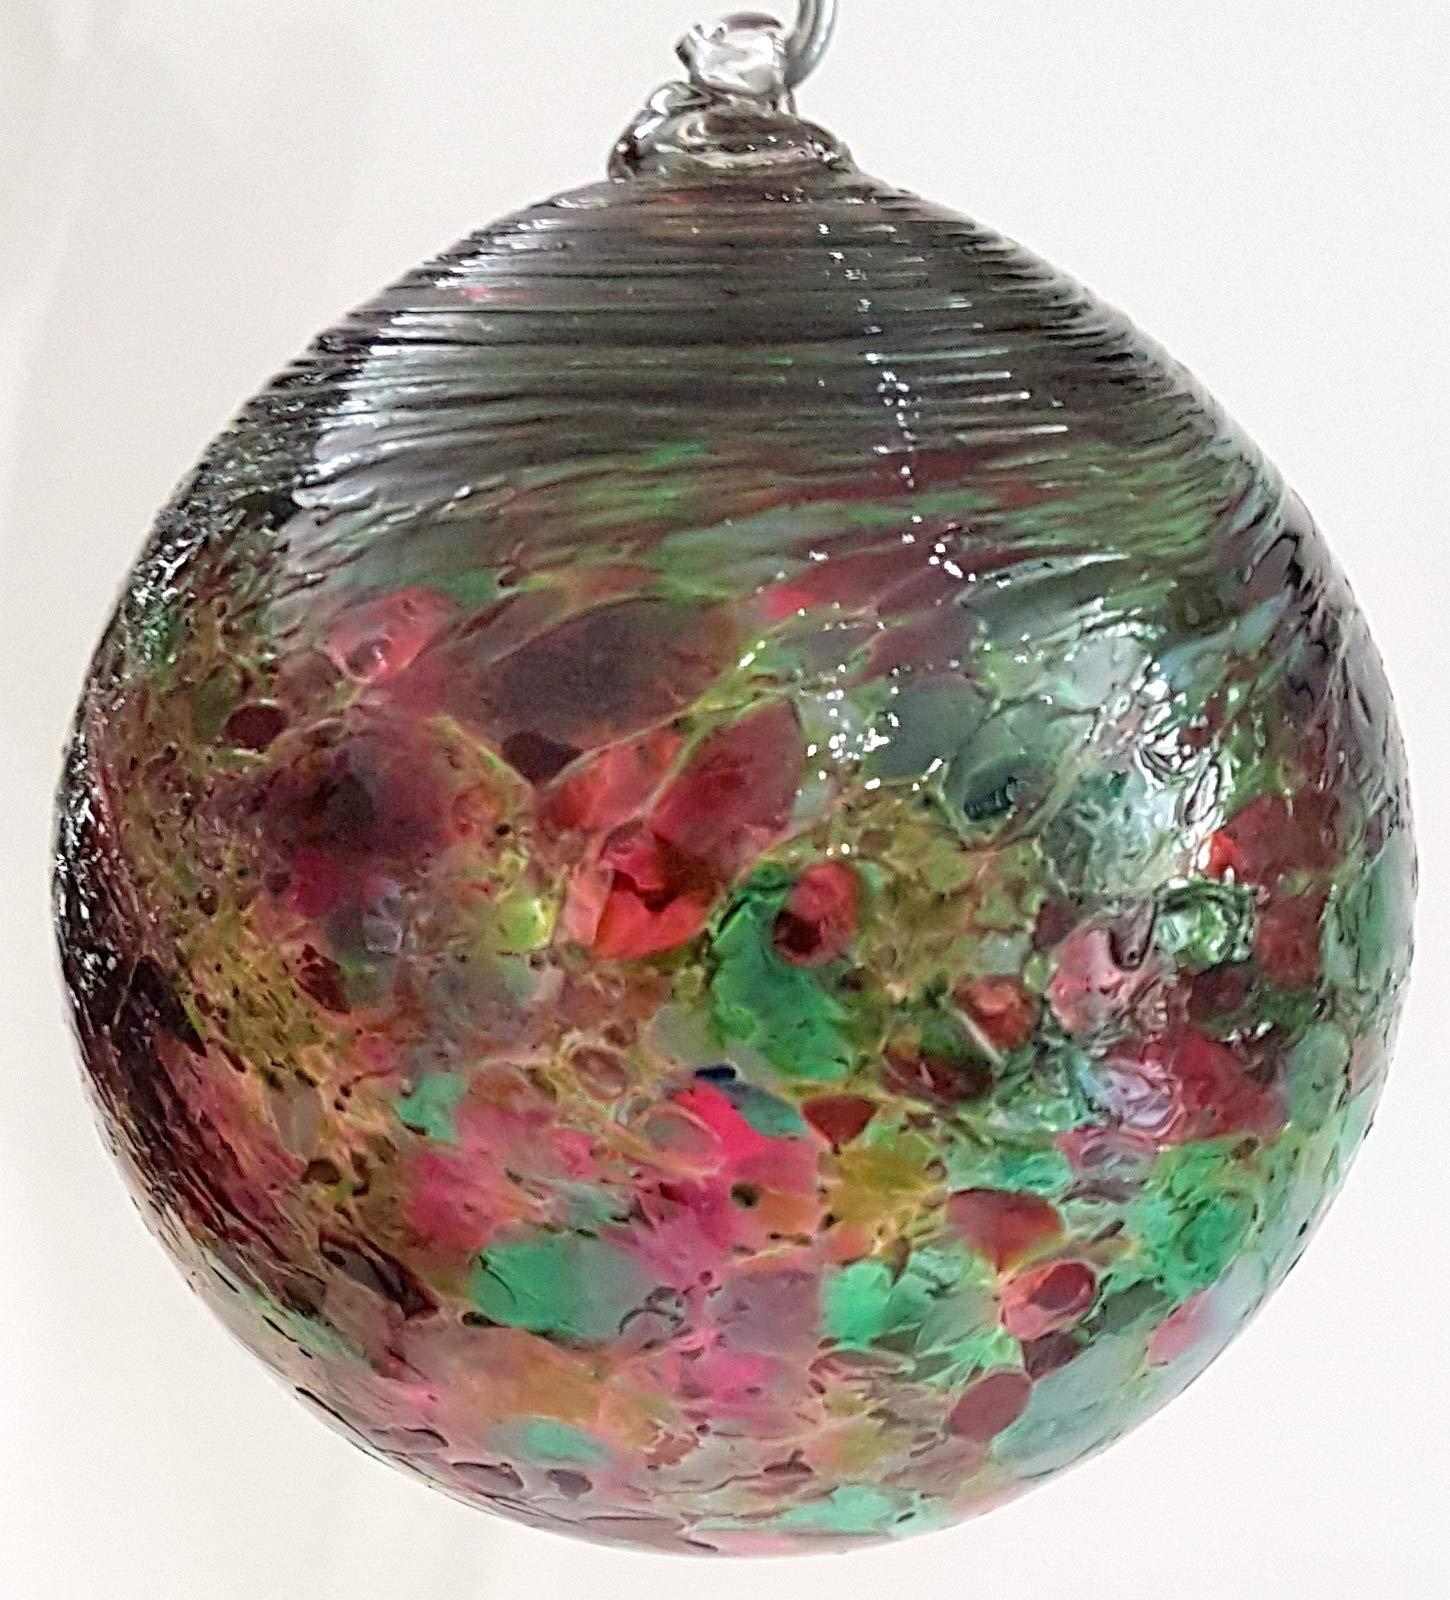 Oberstdorfer-Glashtte-Kugel-zum-hngen-Dekokugel-Fensterkugel-Bunte-Glaskugel-Ornament-grn-violett-Fensterdekoration-mundgeblasenes-Kristallglas-Durchmesser-ca-11-cm